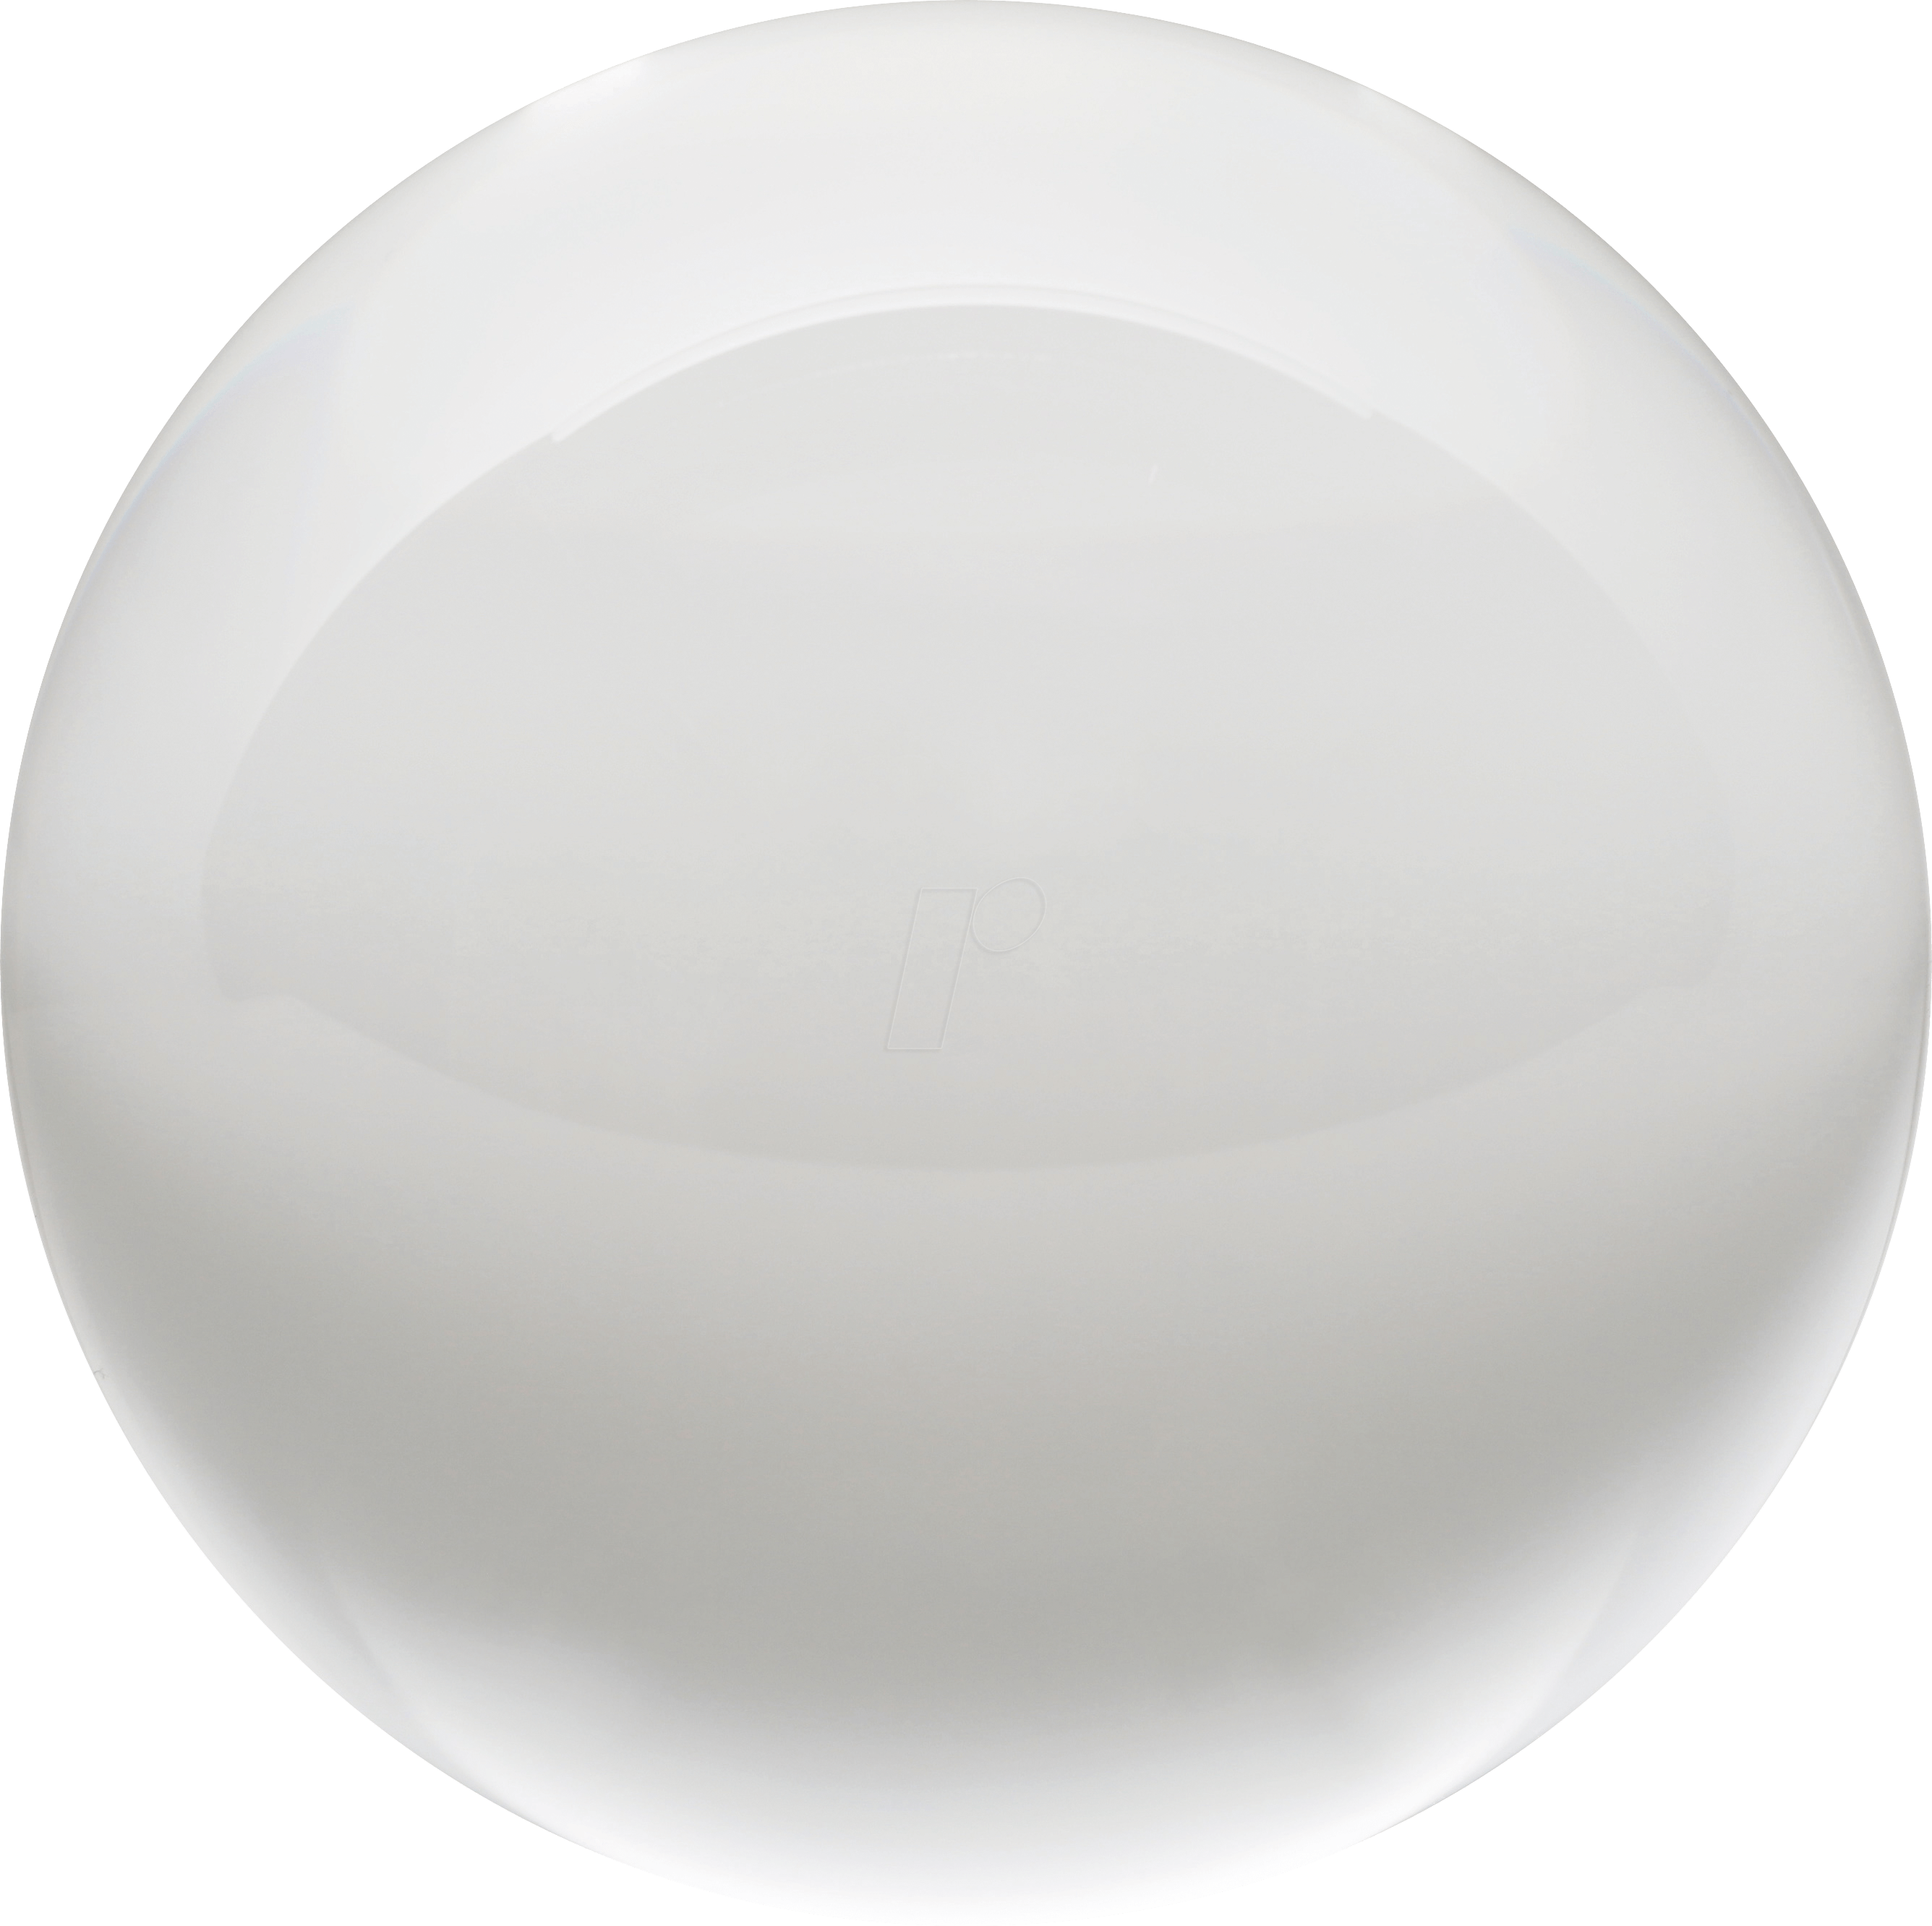 ROLLEI 22667 - Foto, Glaskugel, Lensball, 90 mm